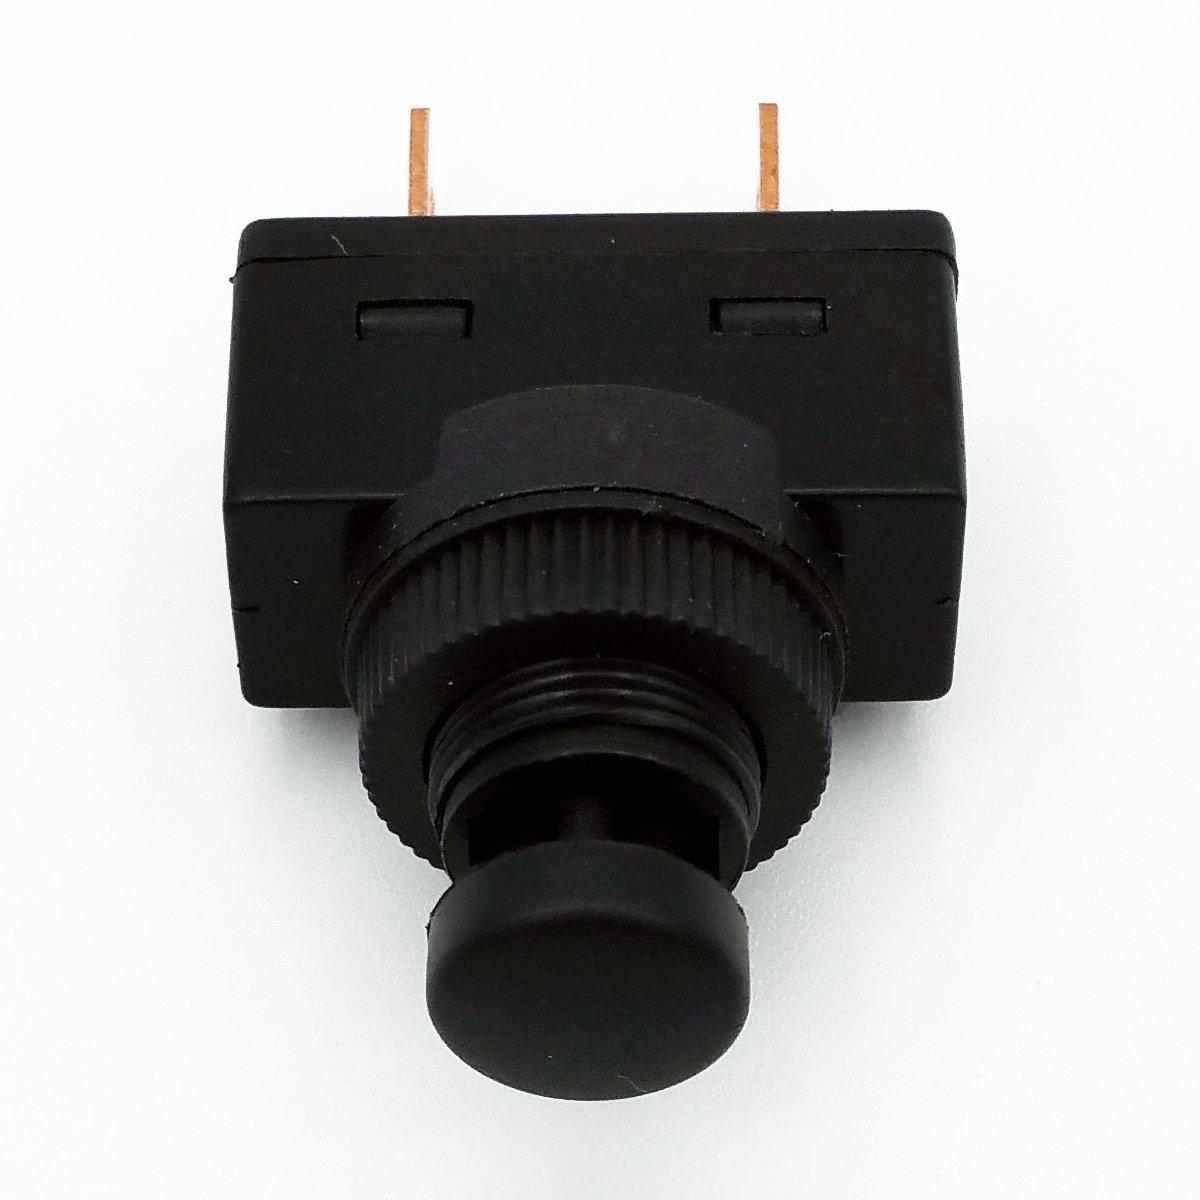 Cambridge Push Button Momentary On Switch 16 AMP 12 Volt DC 192 Watts